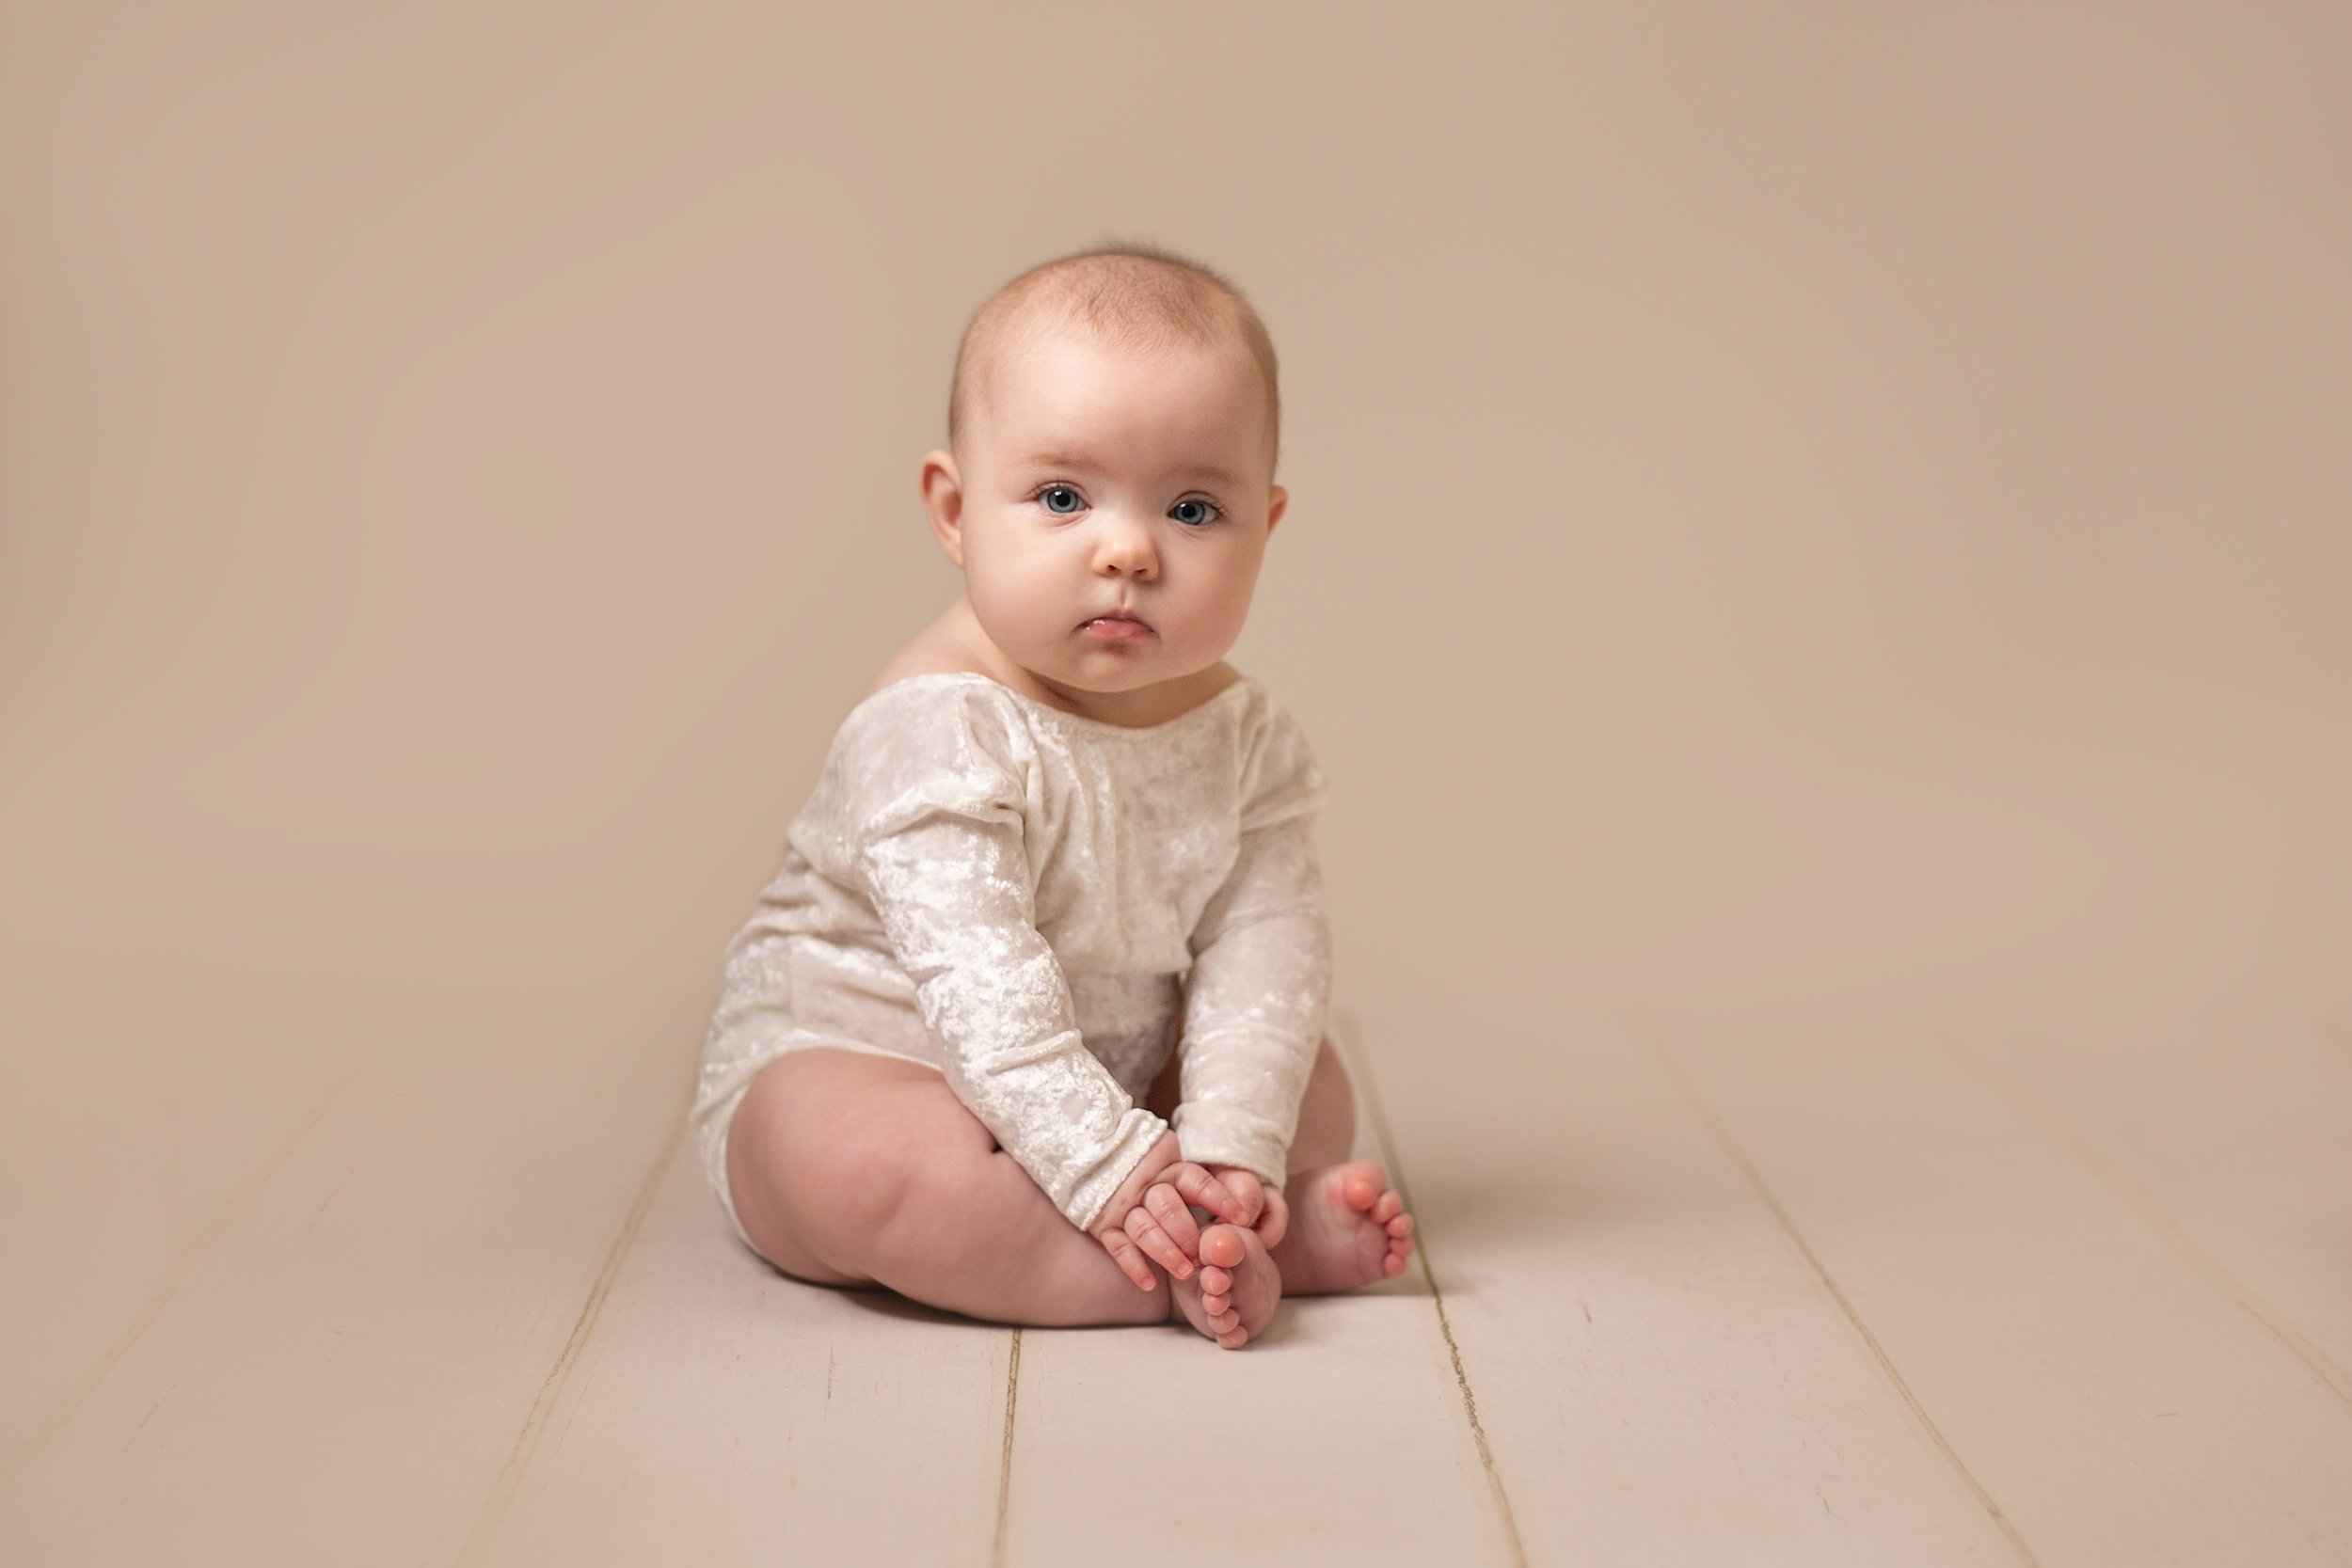 LEA-COOPER-PHOTOGRAPHY-CHILD-PHOTOGRAPHY-WILLENHALL-CHILDREN-PHOTOGRAPHER-WOLVERHAMPTON-BILSTON-WEDNESBURY-KIDS-PHOTOGRAPHER-SITTER-SESSION-MILESTONE--8.JPG